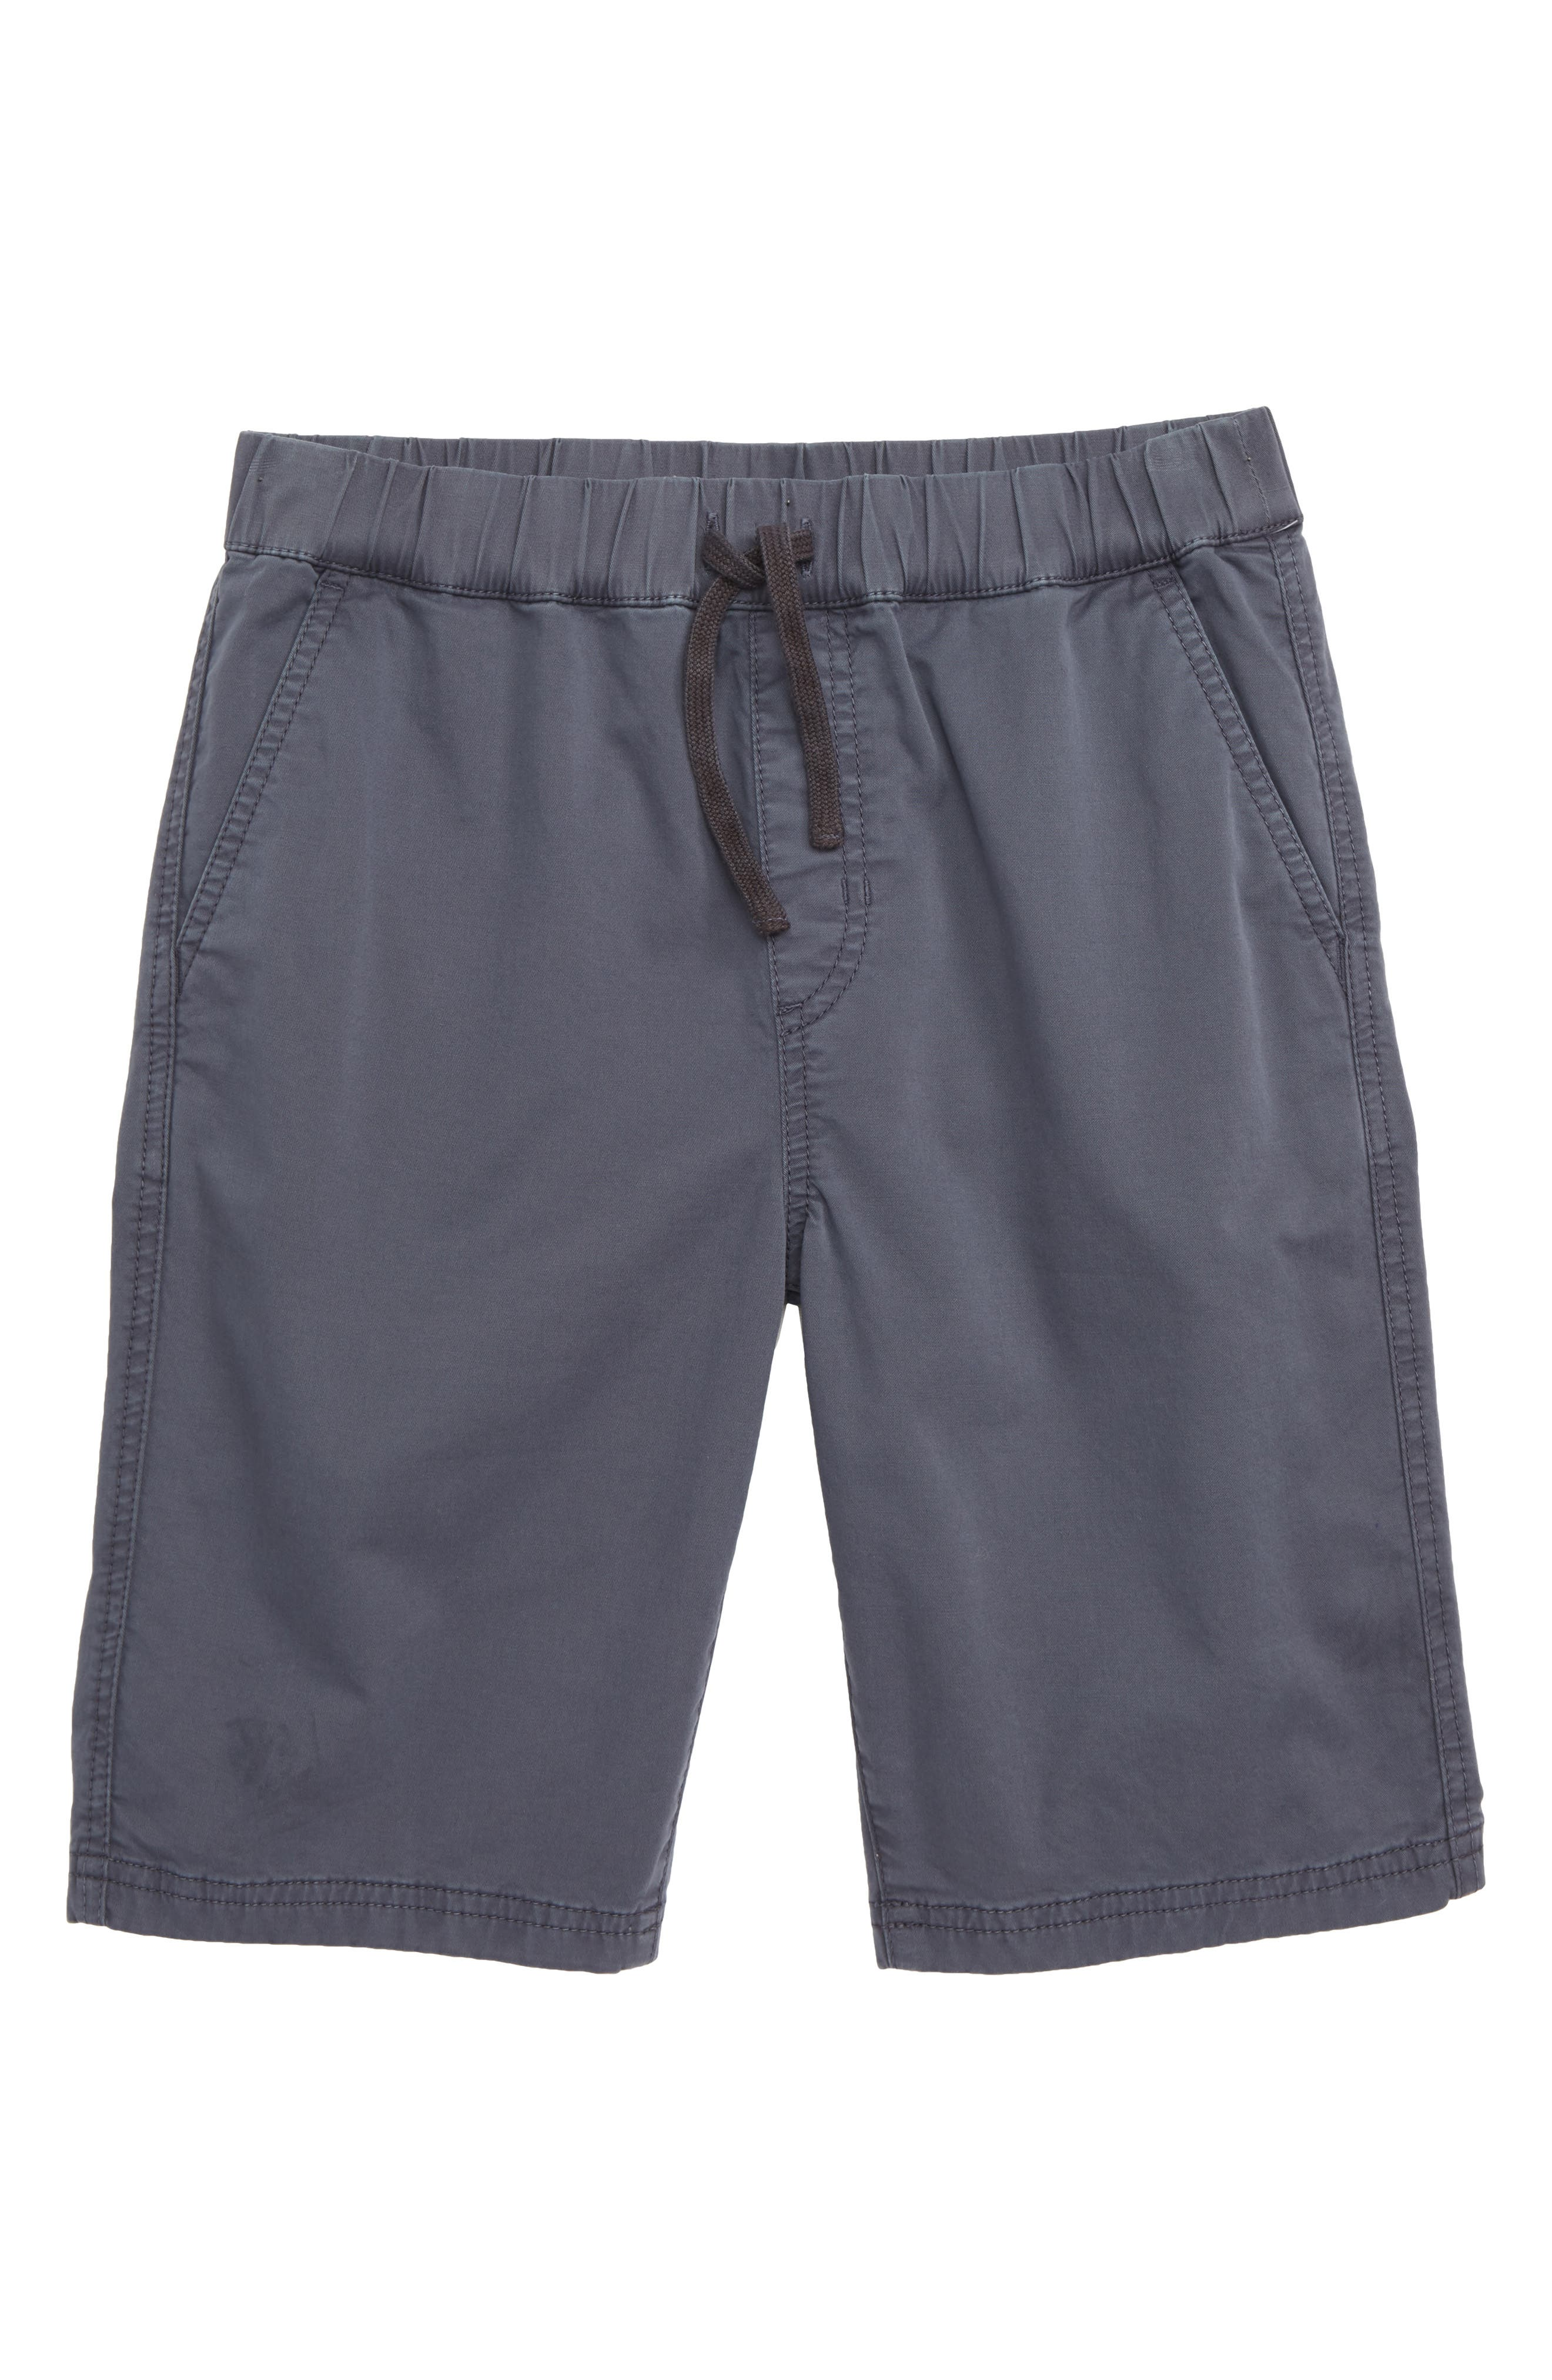 Grind Time Prime Time Shorts, Main, color, GREY FLANNEL